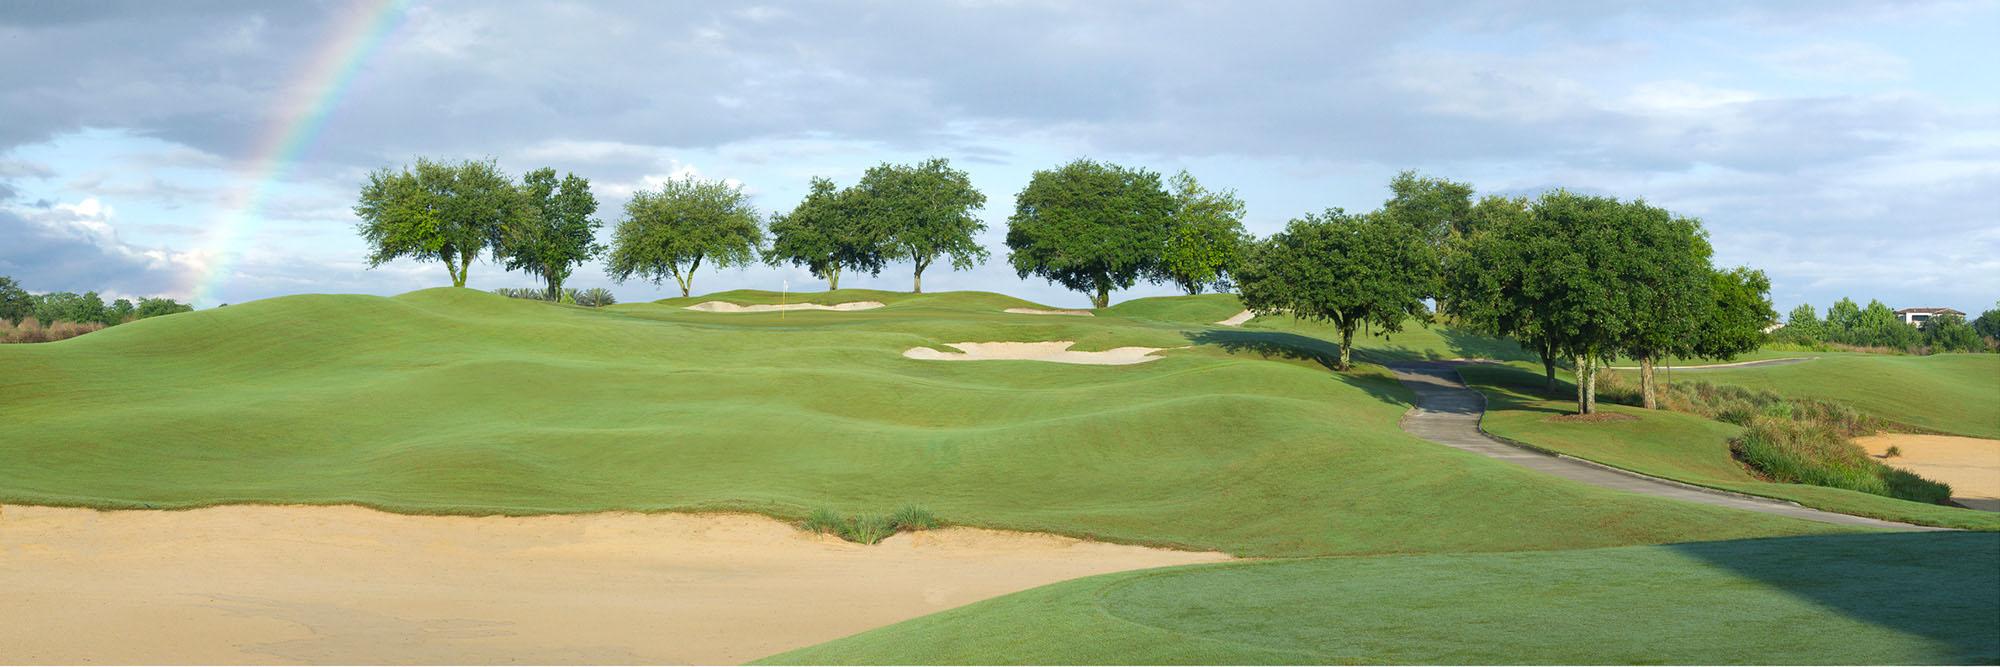 Golf Course Image - Reunion Resort Watson No. 15